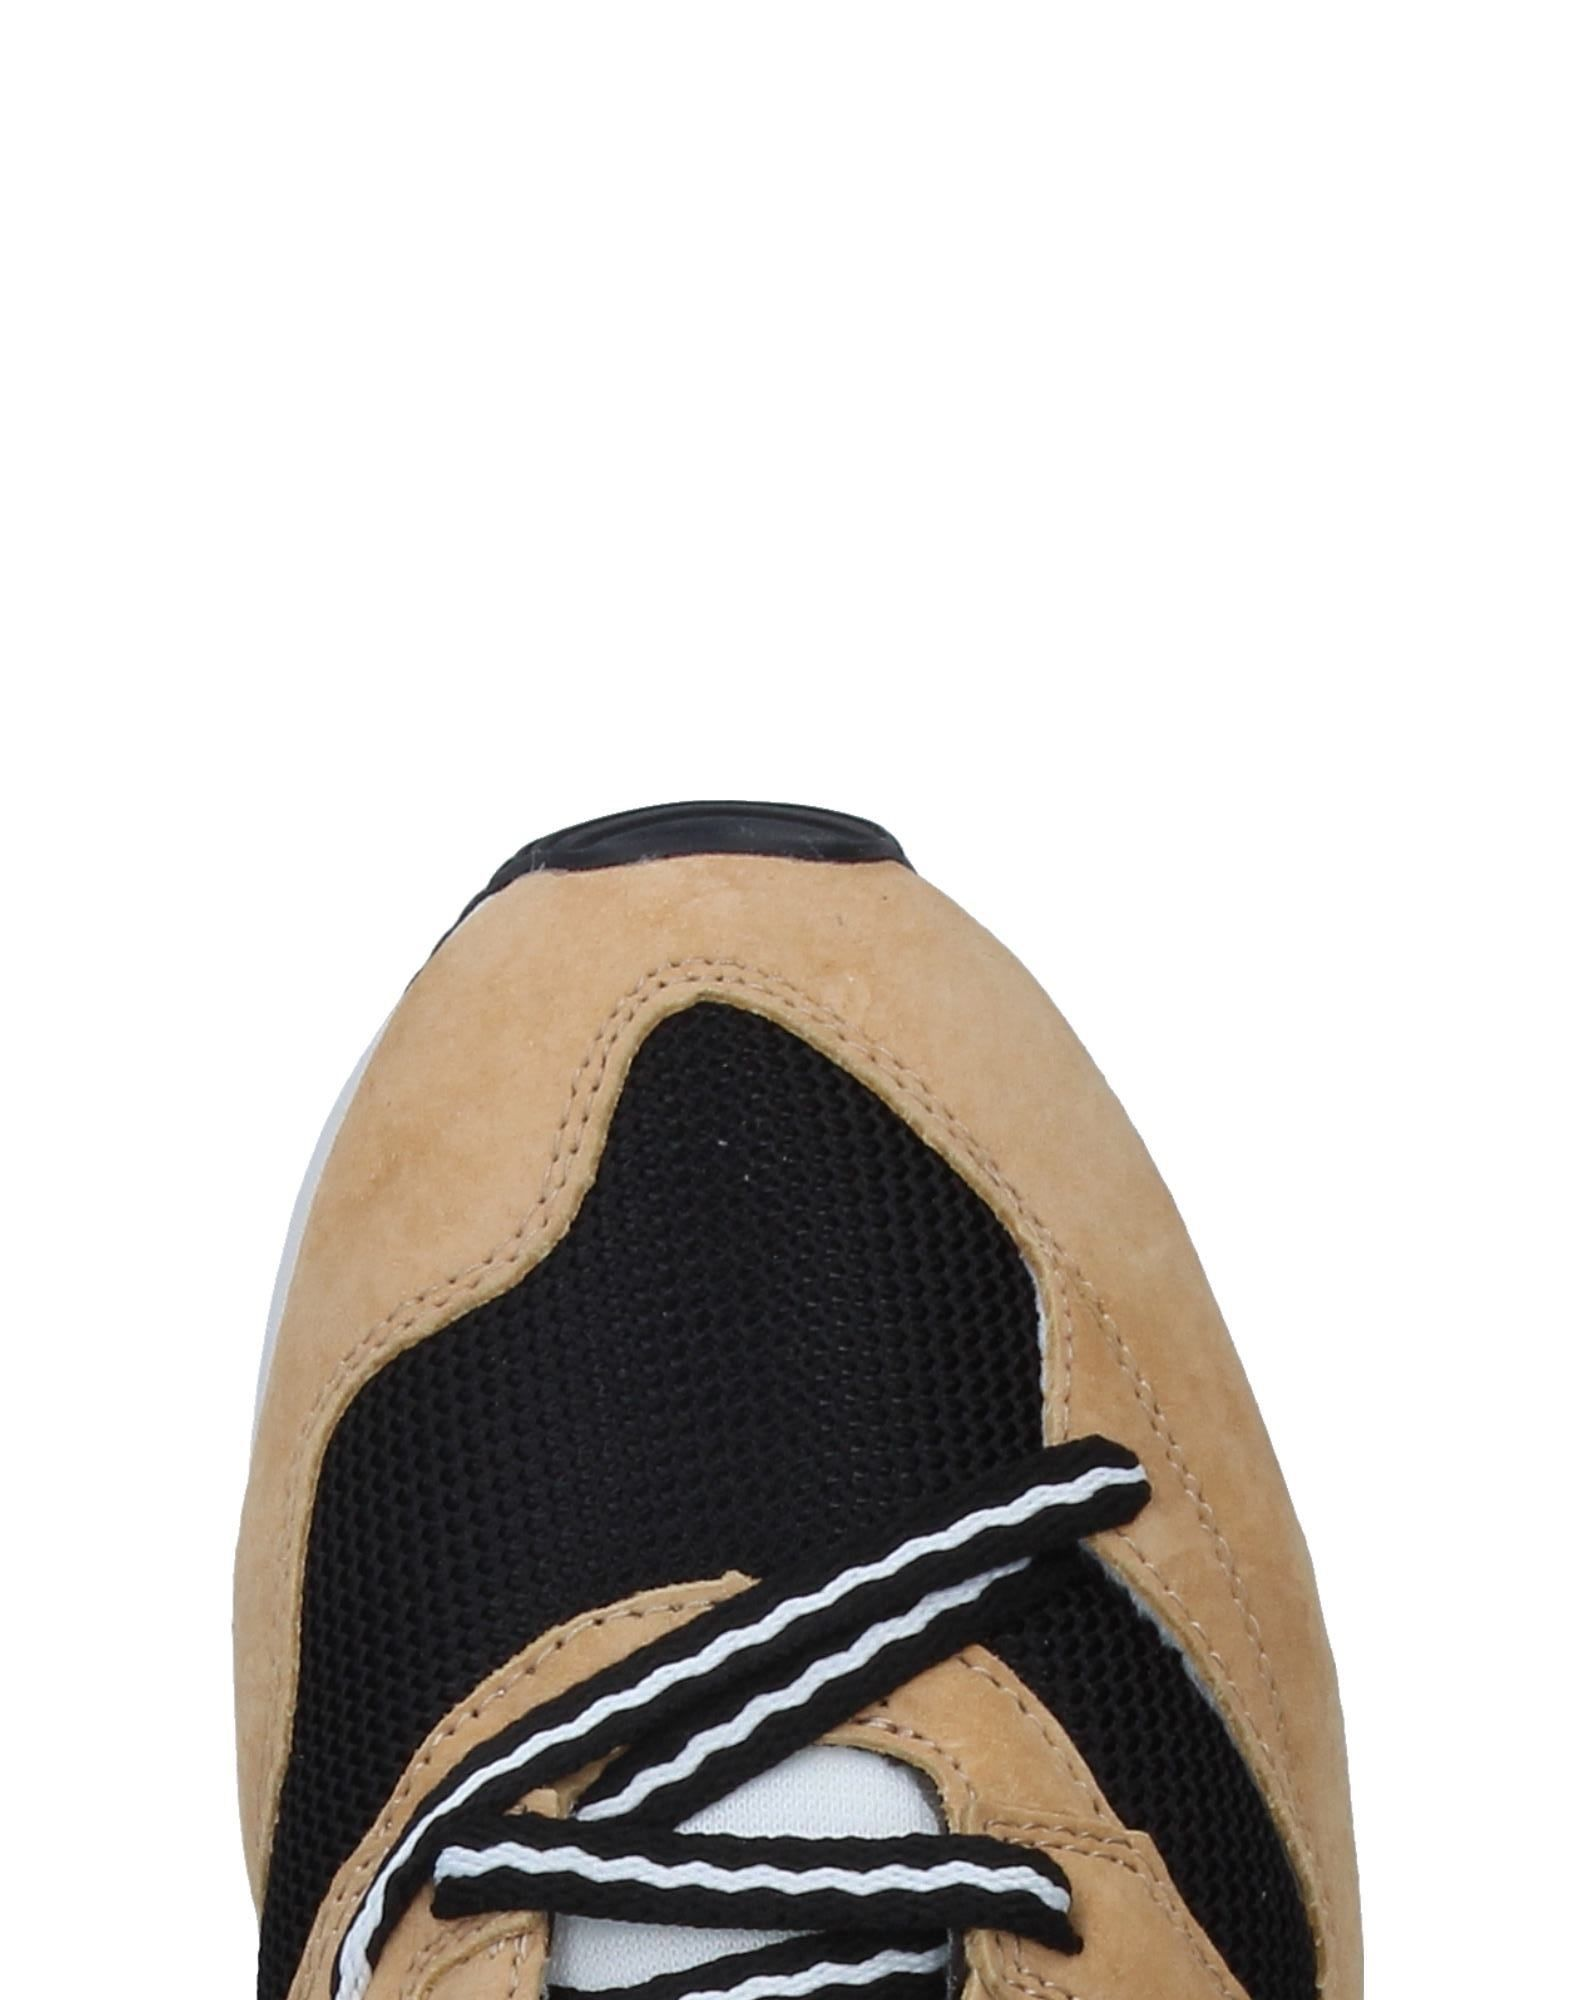 Rabatt echte Sneakers Schuhe Karhu Sneakers echte Herren  11360543IC 35ff8e